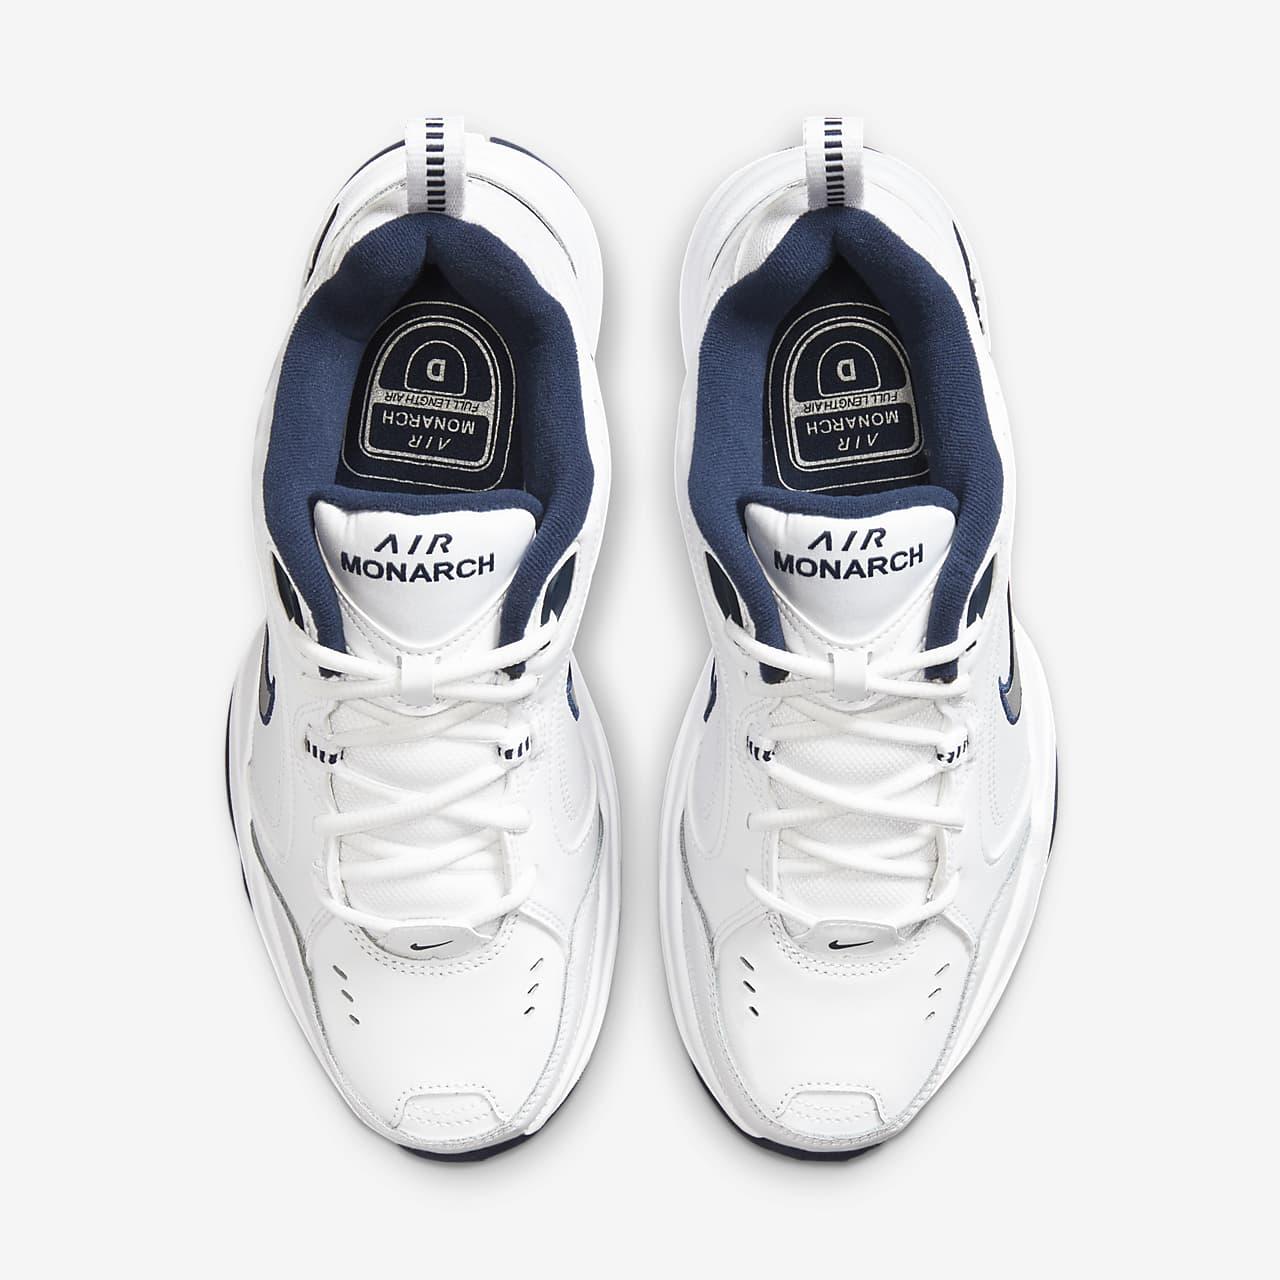 new styles c6abf 58556 ... Кроссовки для занятий в зале на каждый день Nike Air Monarch IV